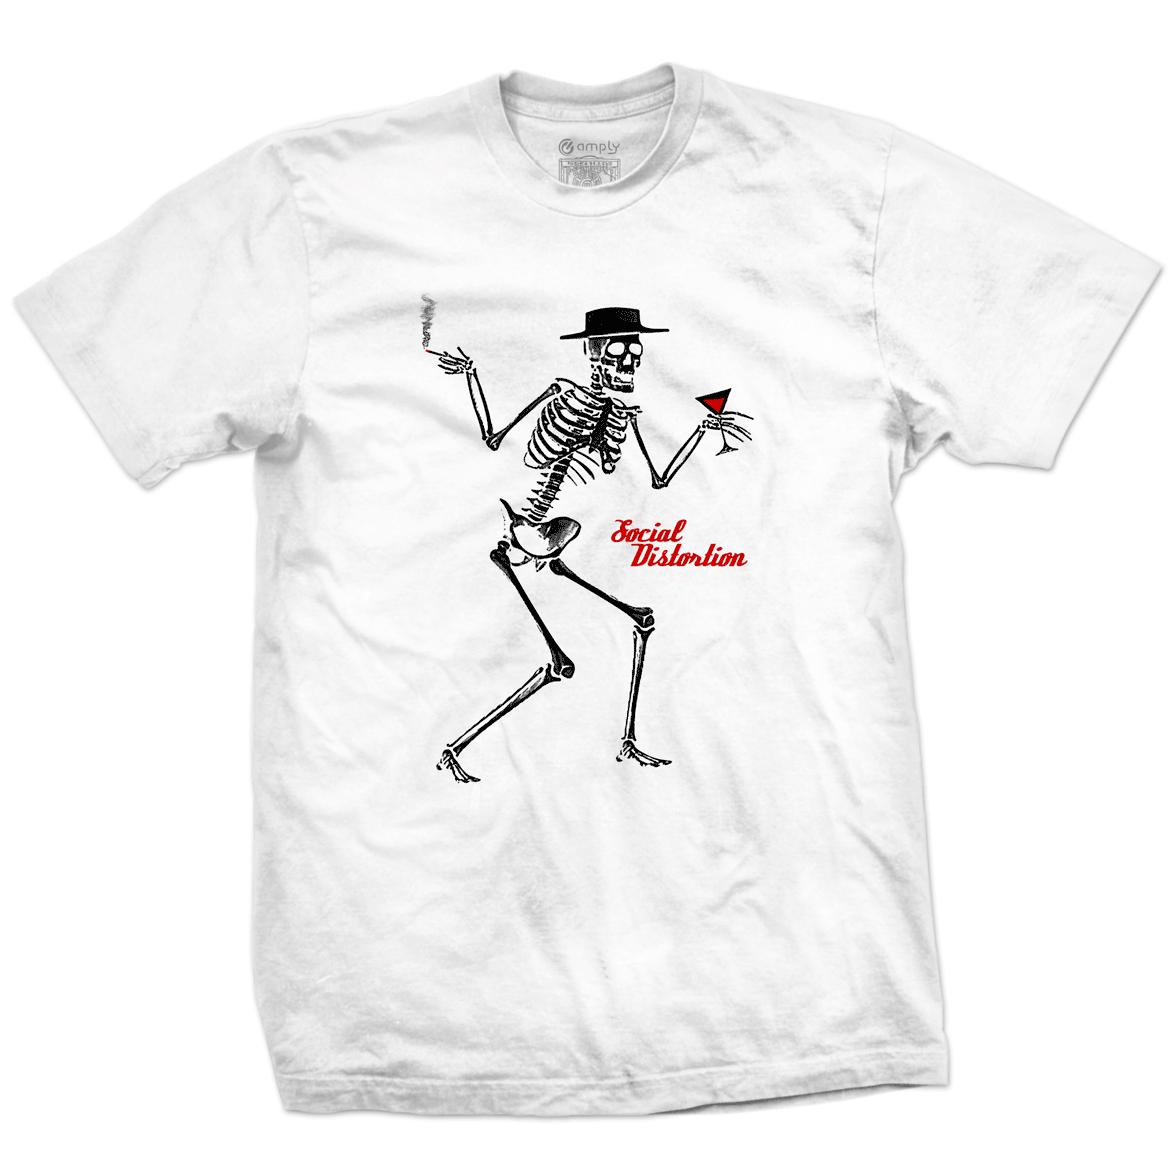 Camiseta Social Distorion